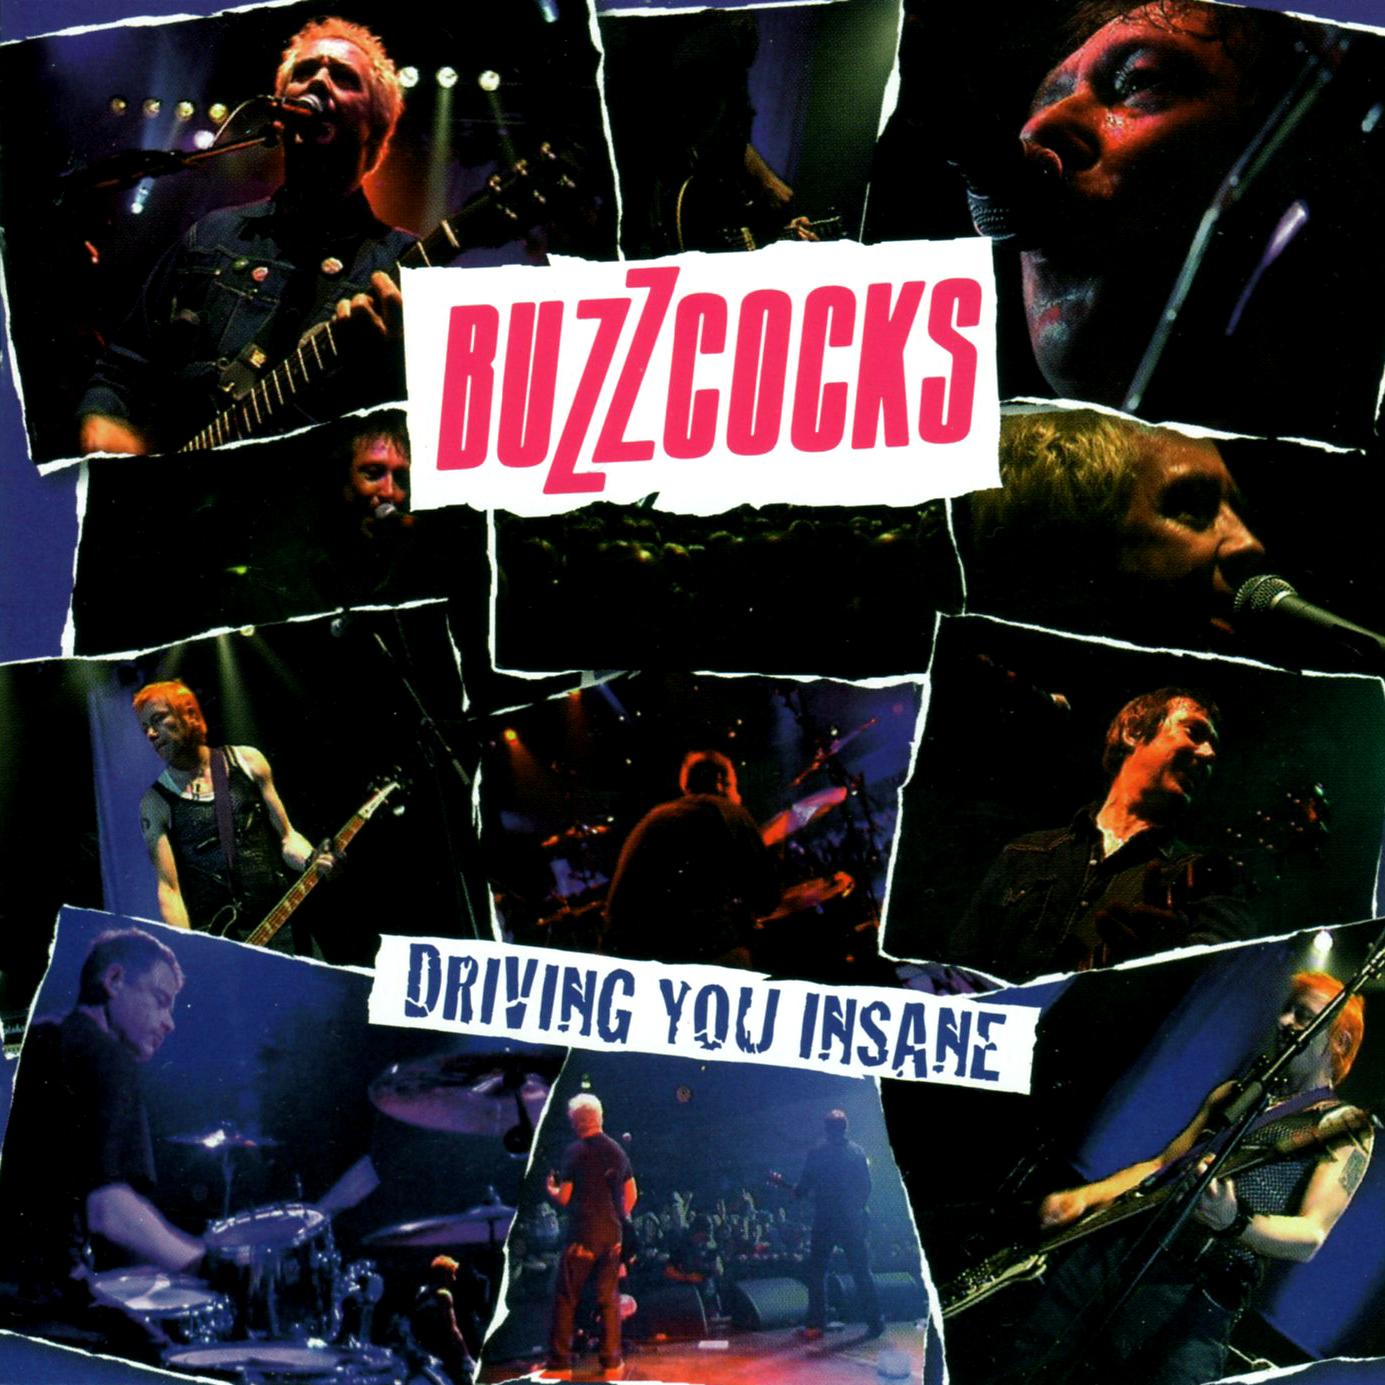 Recorded Live At Shepherds Bush Empire, London, England. 27th April 2003